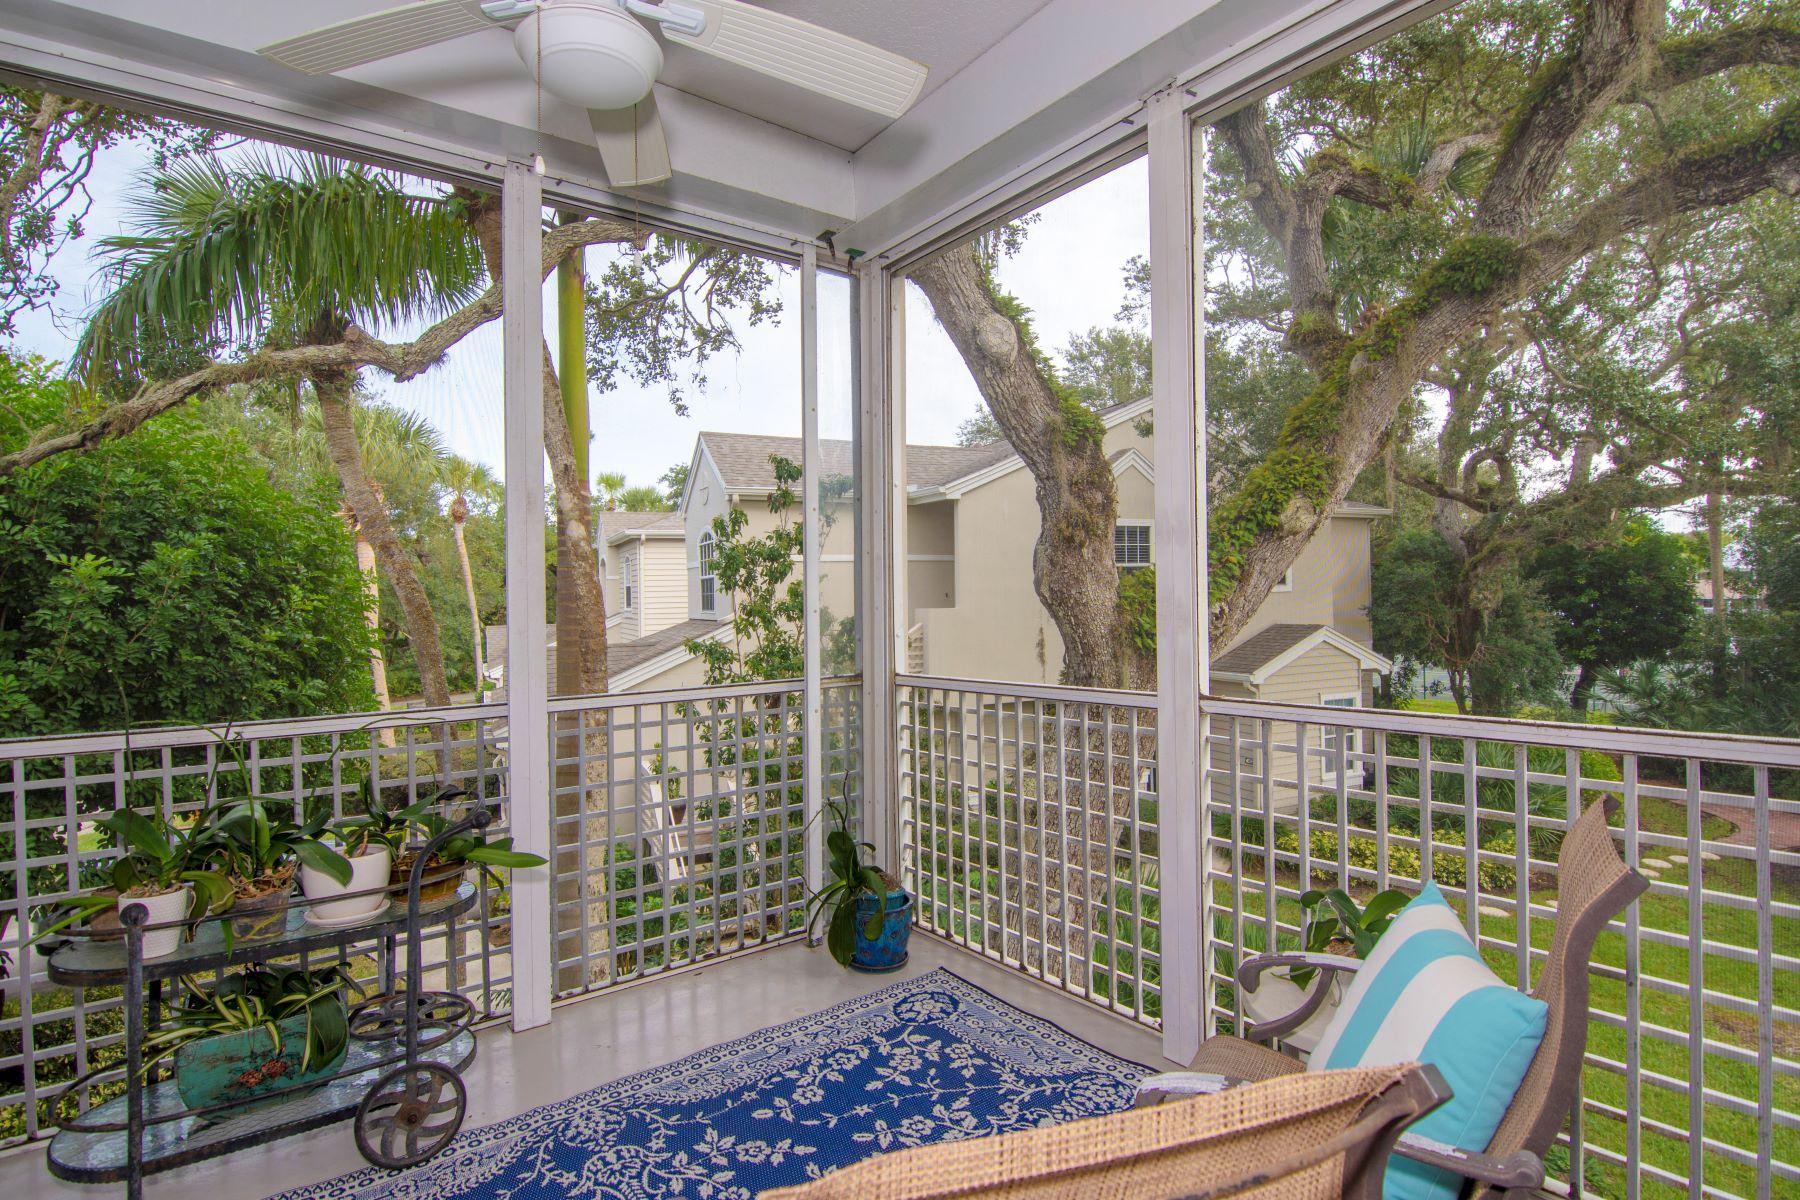 1380 Winding Oaks Circle W 1380 Winding Oaks Circle W 603 Vero Beach, Floride 32963 États-Unis